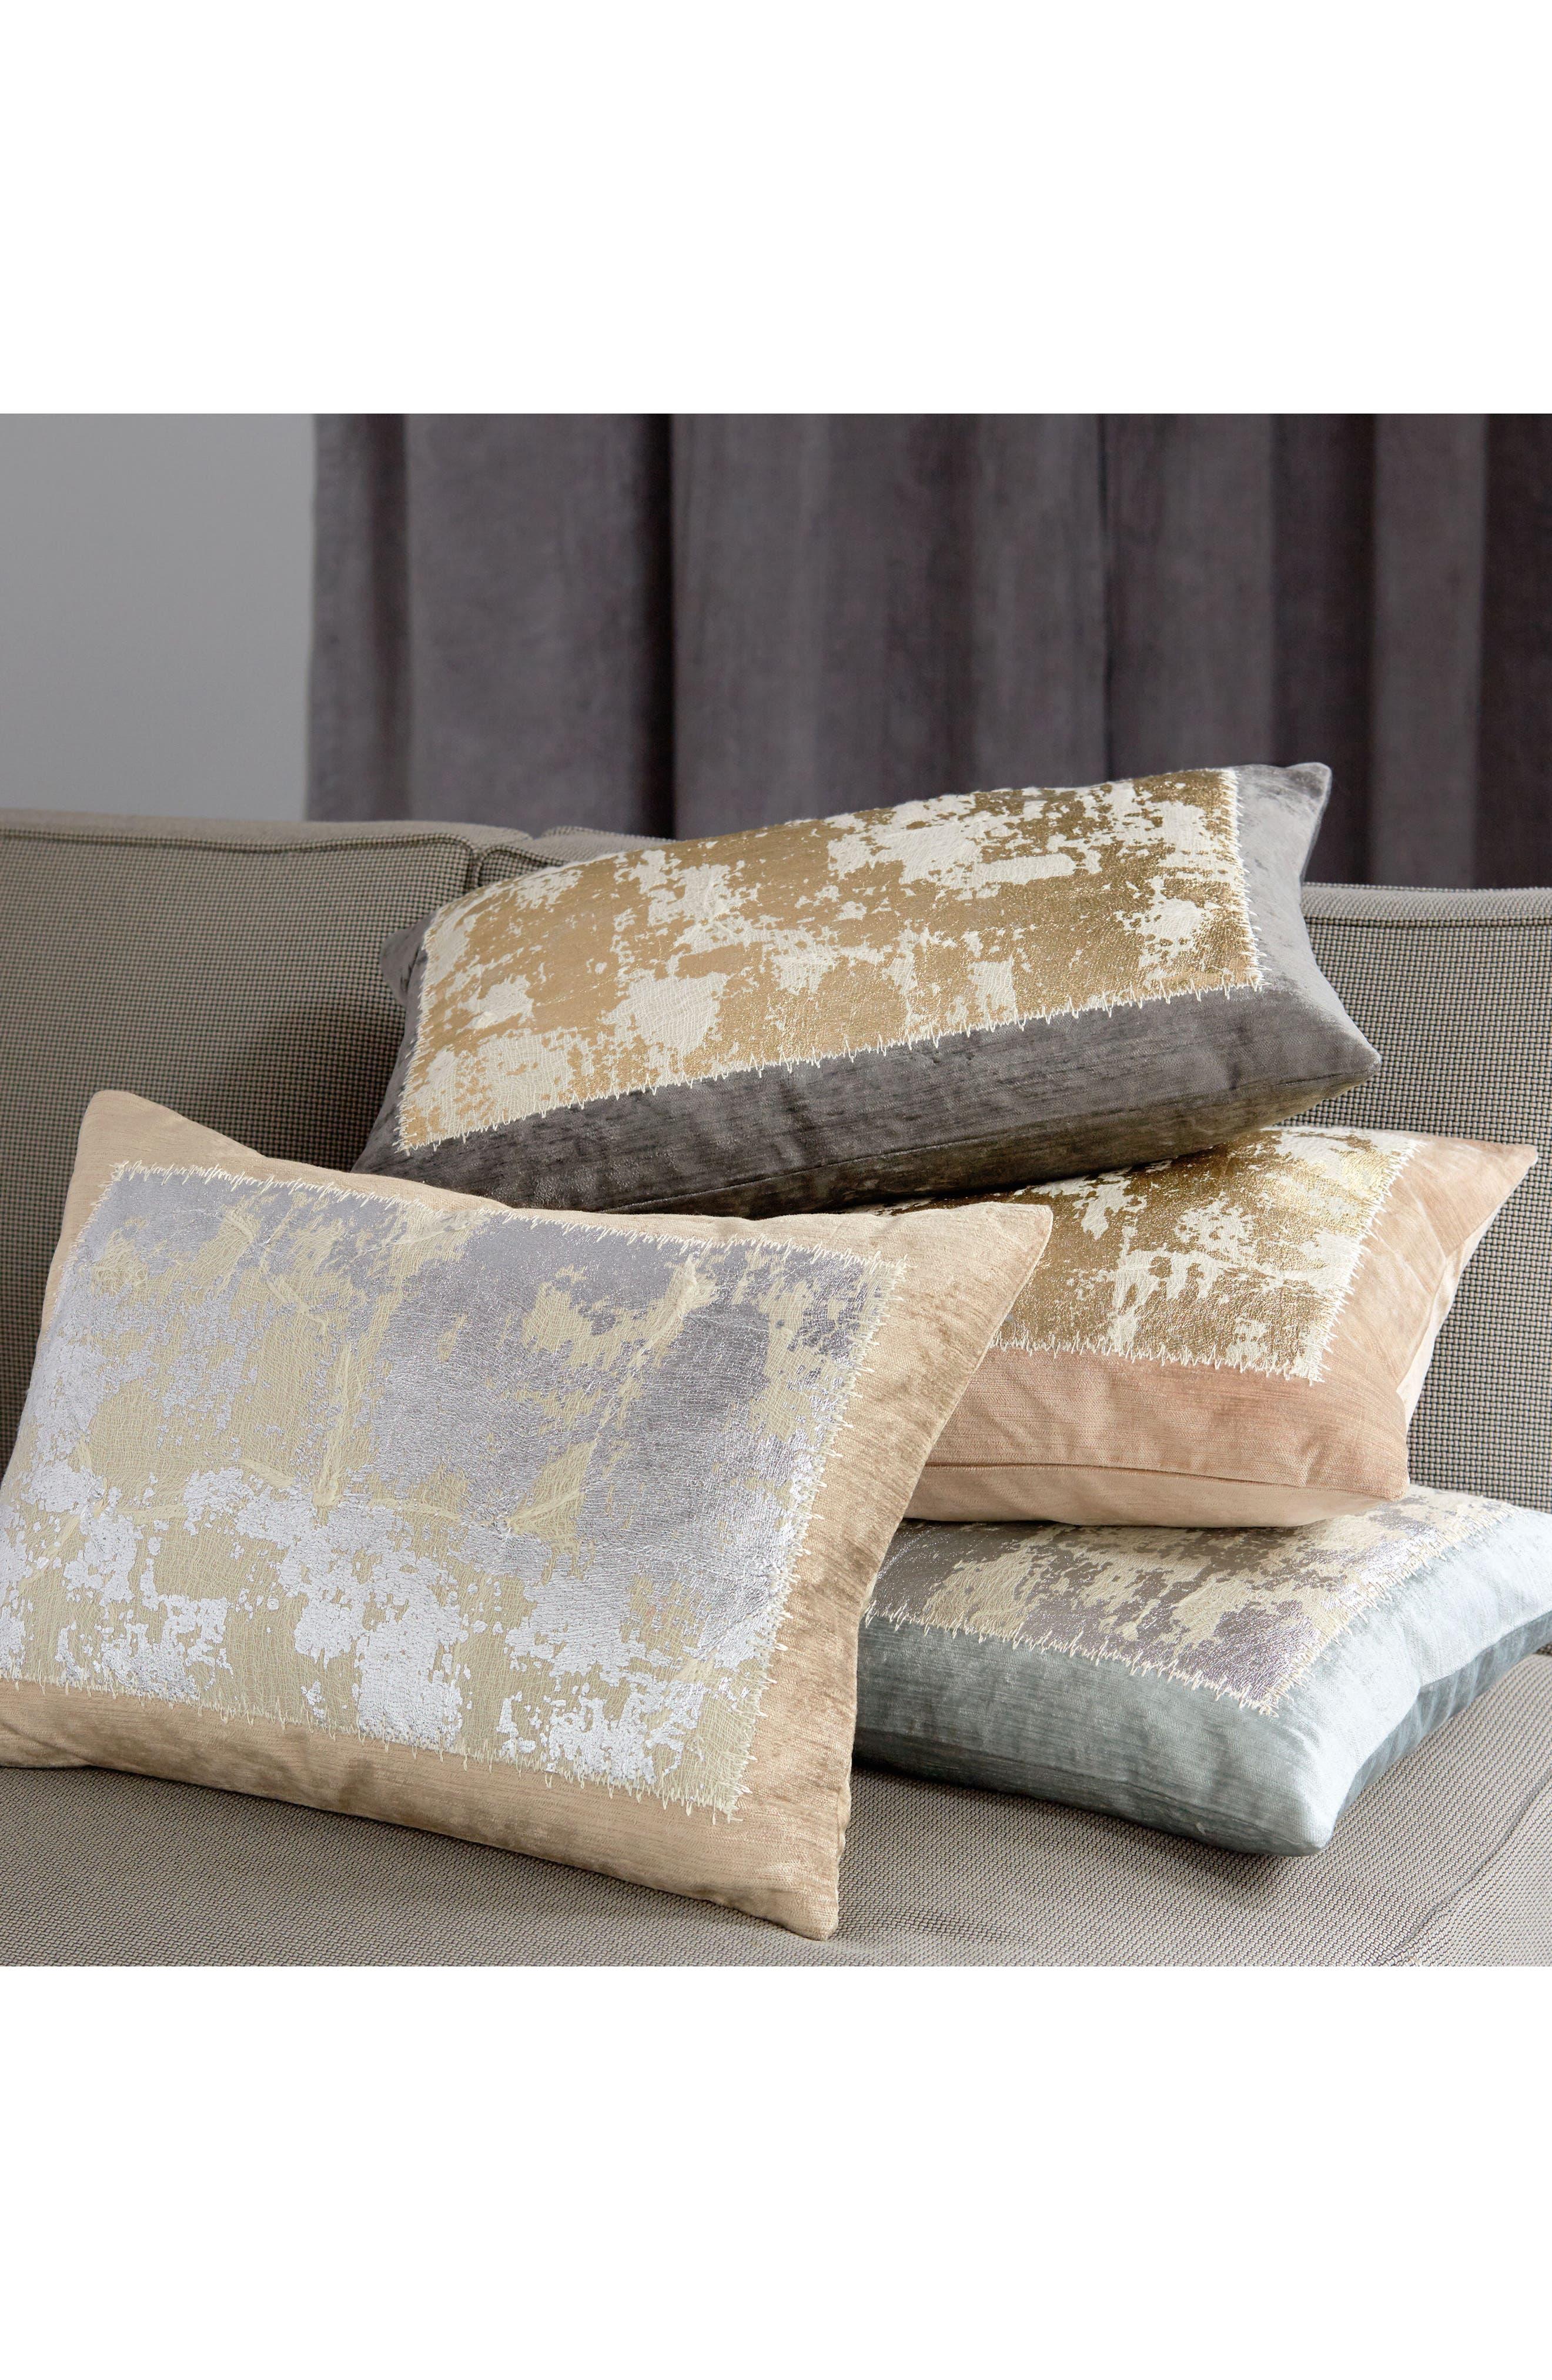 Distressed Metallic Accent Pillow,                             Alternate thumbnail 2, color,                             BLUSH